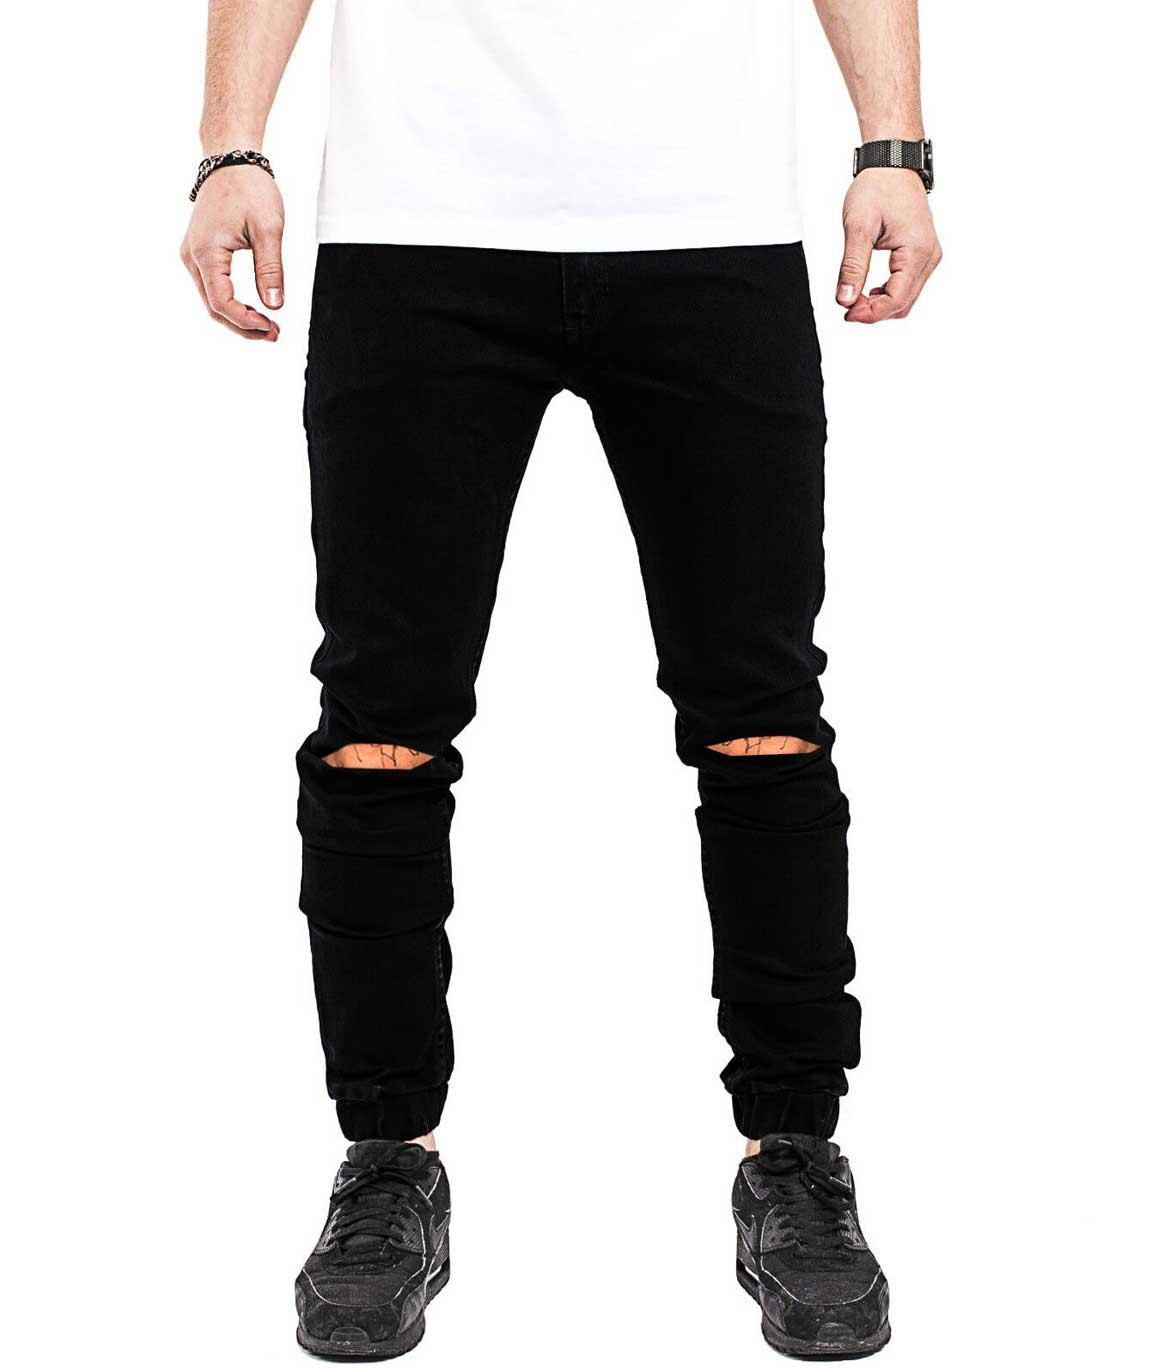 Stylish Black Slim Fit Knee Cut Jogger